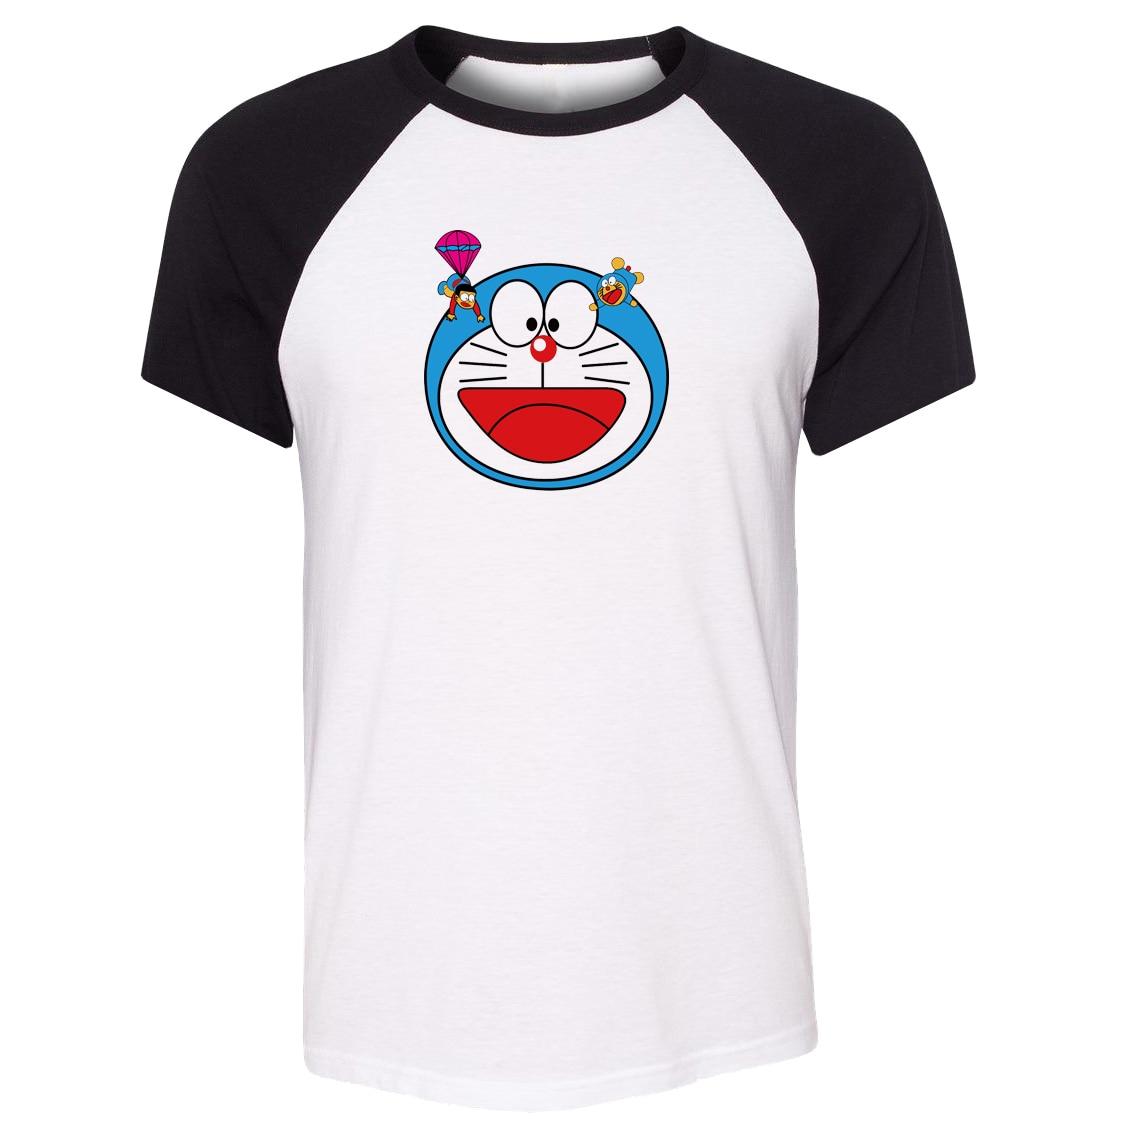 Design shirt japan - Idzn Unisex Summer T Shirt Japan Cartoon Doraemon Nobita Nobi Art Pattern Design Raglan Short